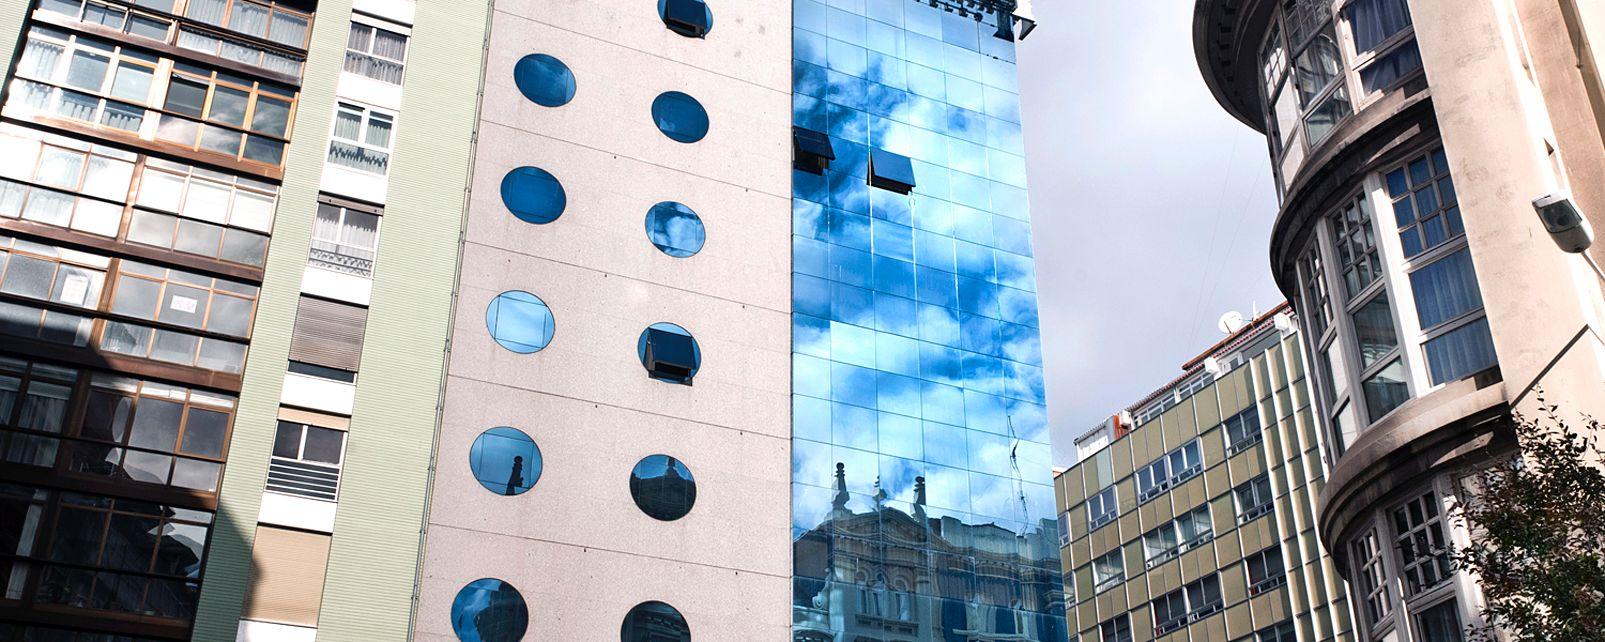 Hôtel Hesperia A Coruña